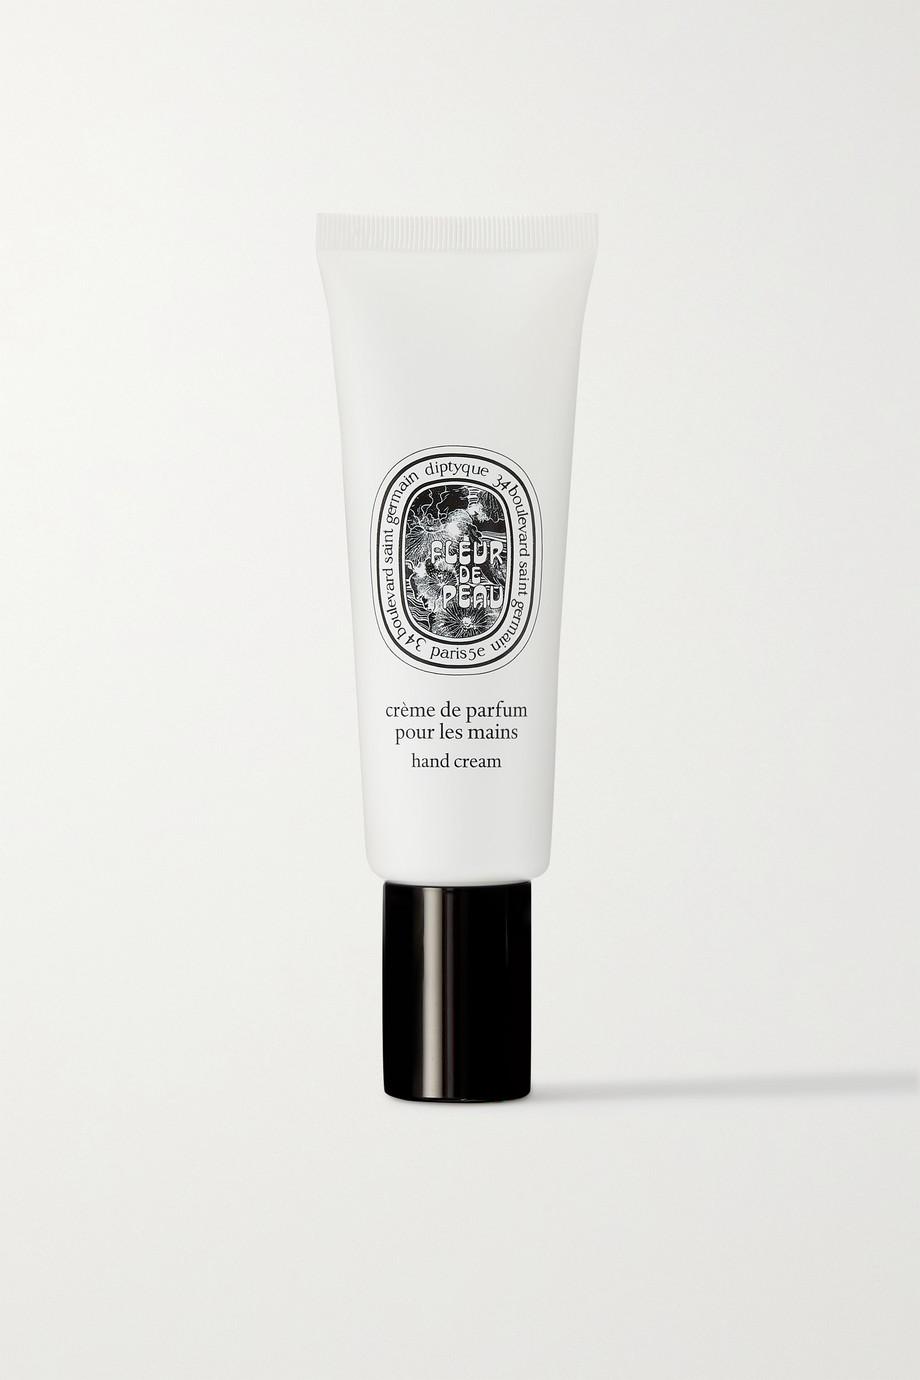 Diptyque Hand Cream – Fleur de Peau, 45 ml – Handcreme